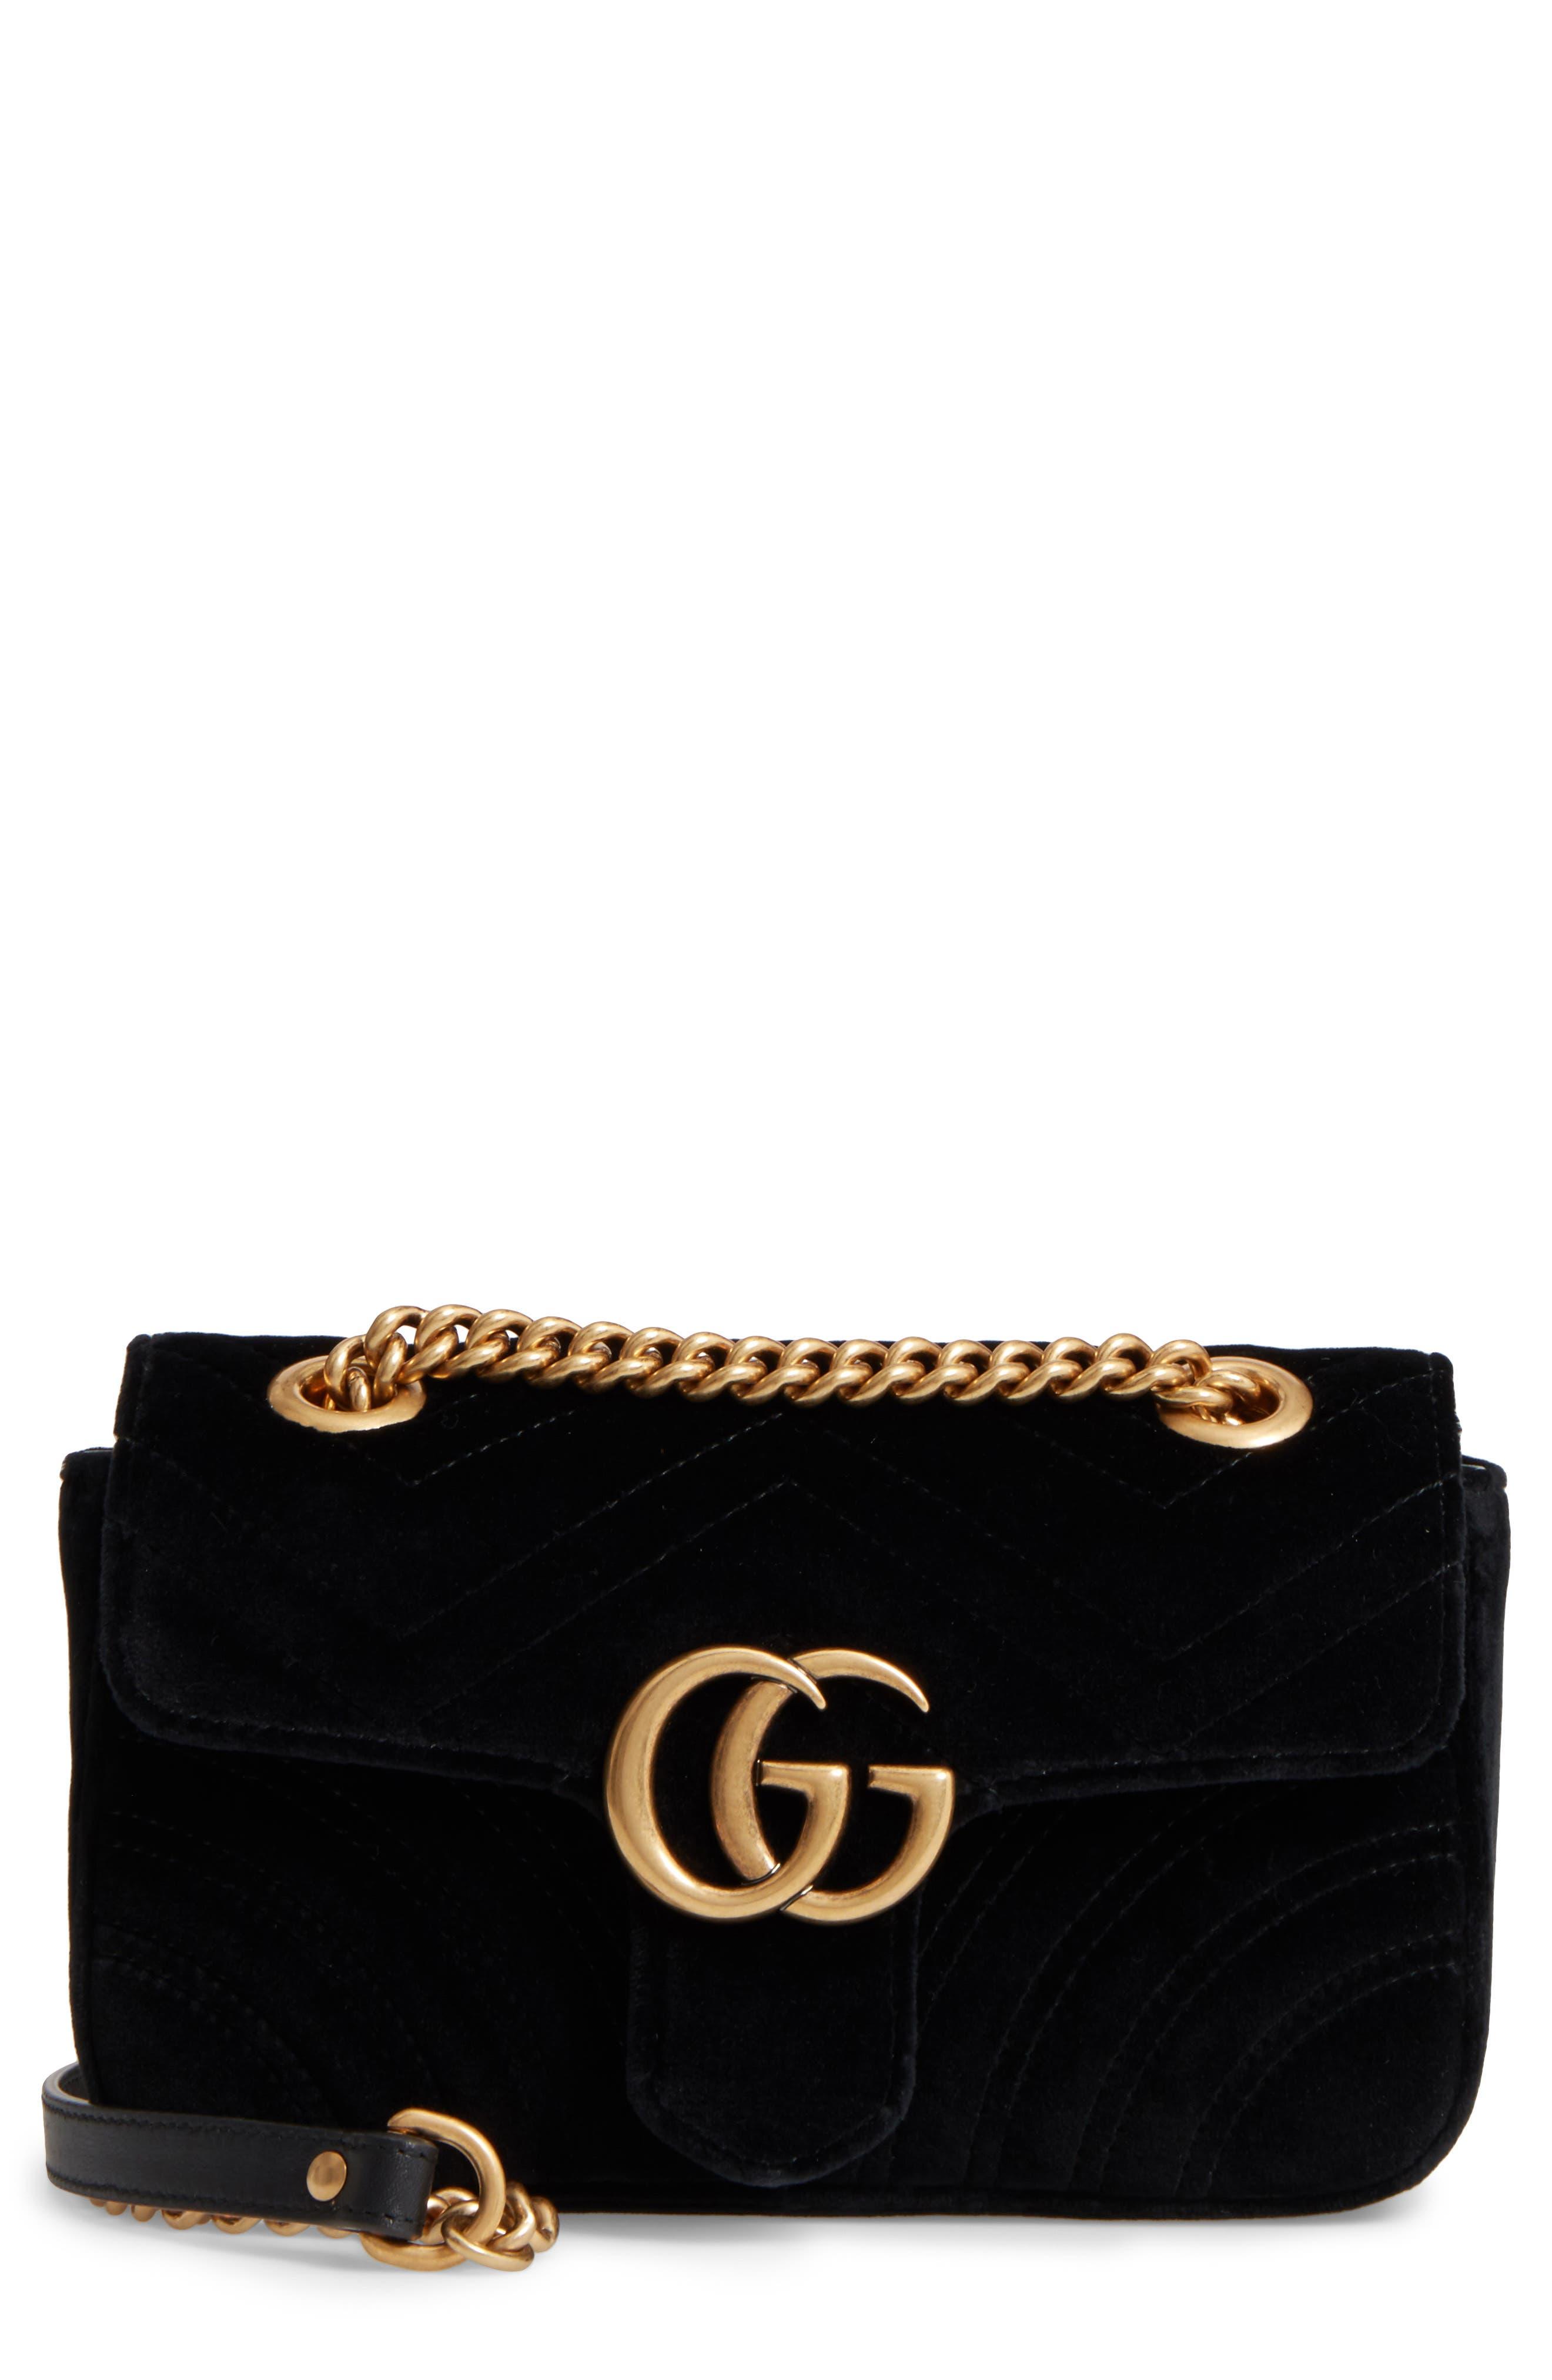 Alternate Image 1 Selected - Gucci Small GG Marmont 2.0 Matelassé Velvet Shoulder Bag